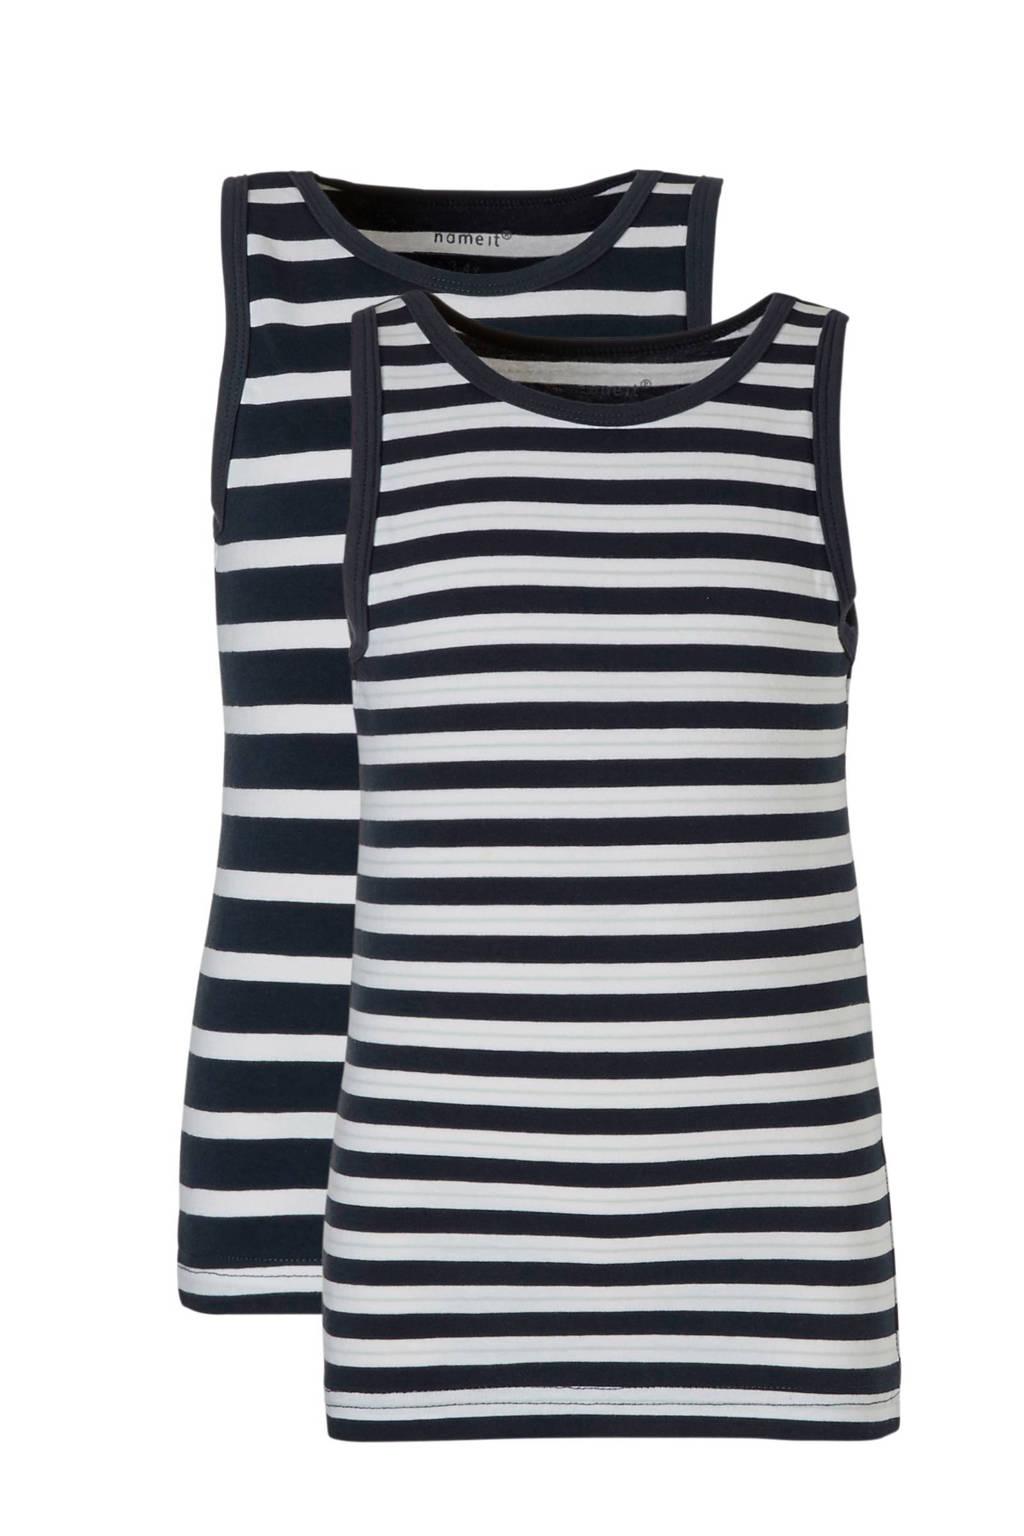 name it MINI hemd (set van 2), Donkerblauw/wit